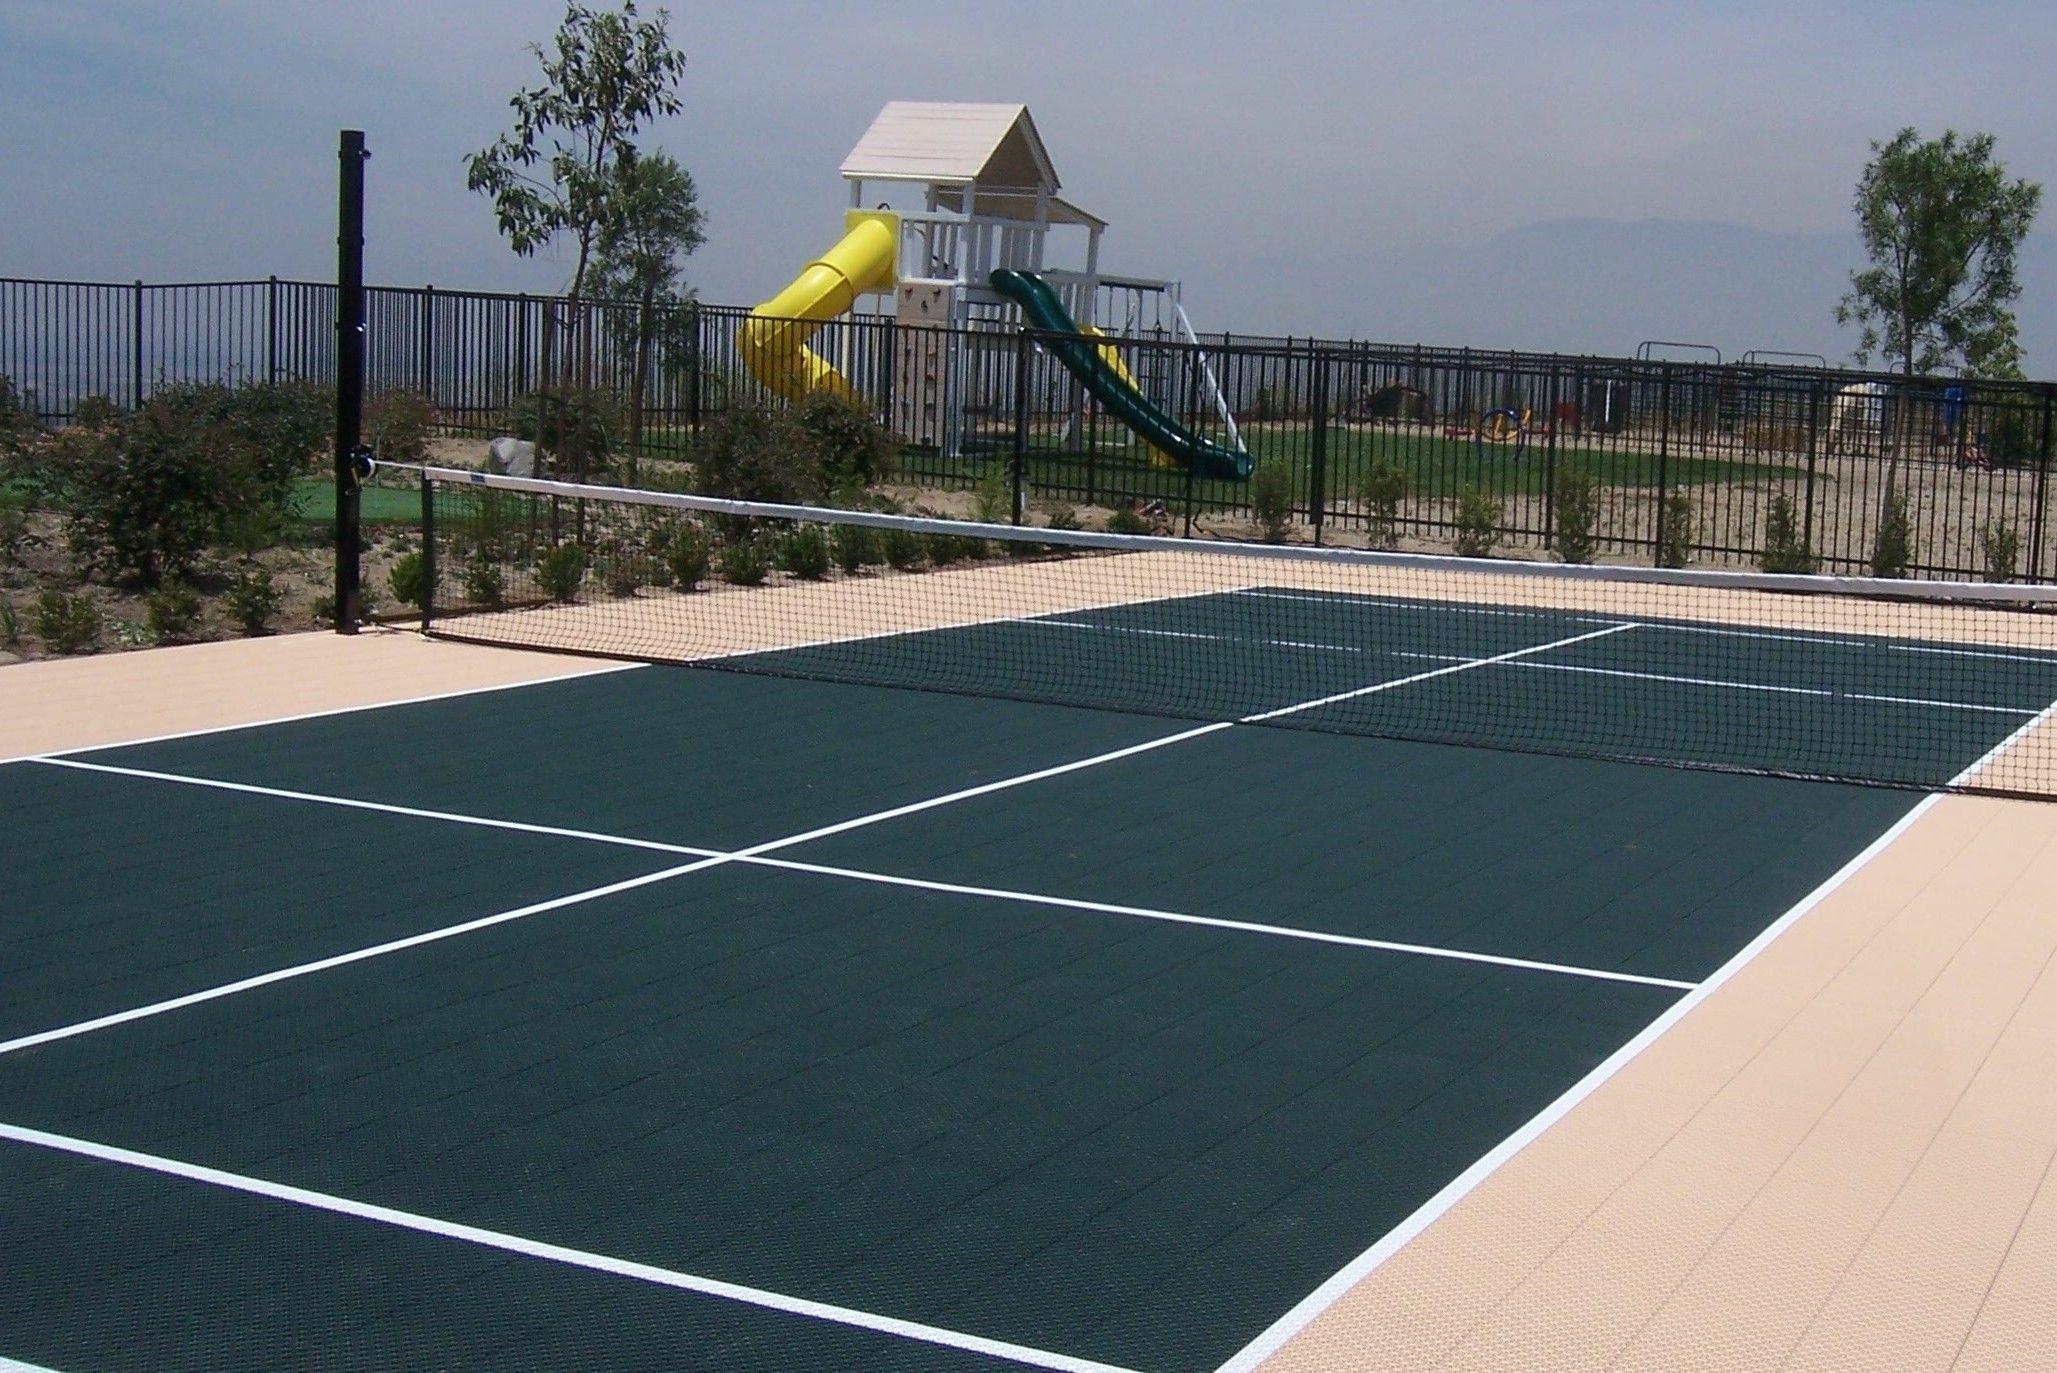 Richman Ca Paddle Tennis Court Jpg 2057 1373 Tennis Court Indoor Sports Court Outdoor